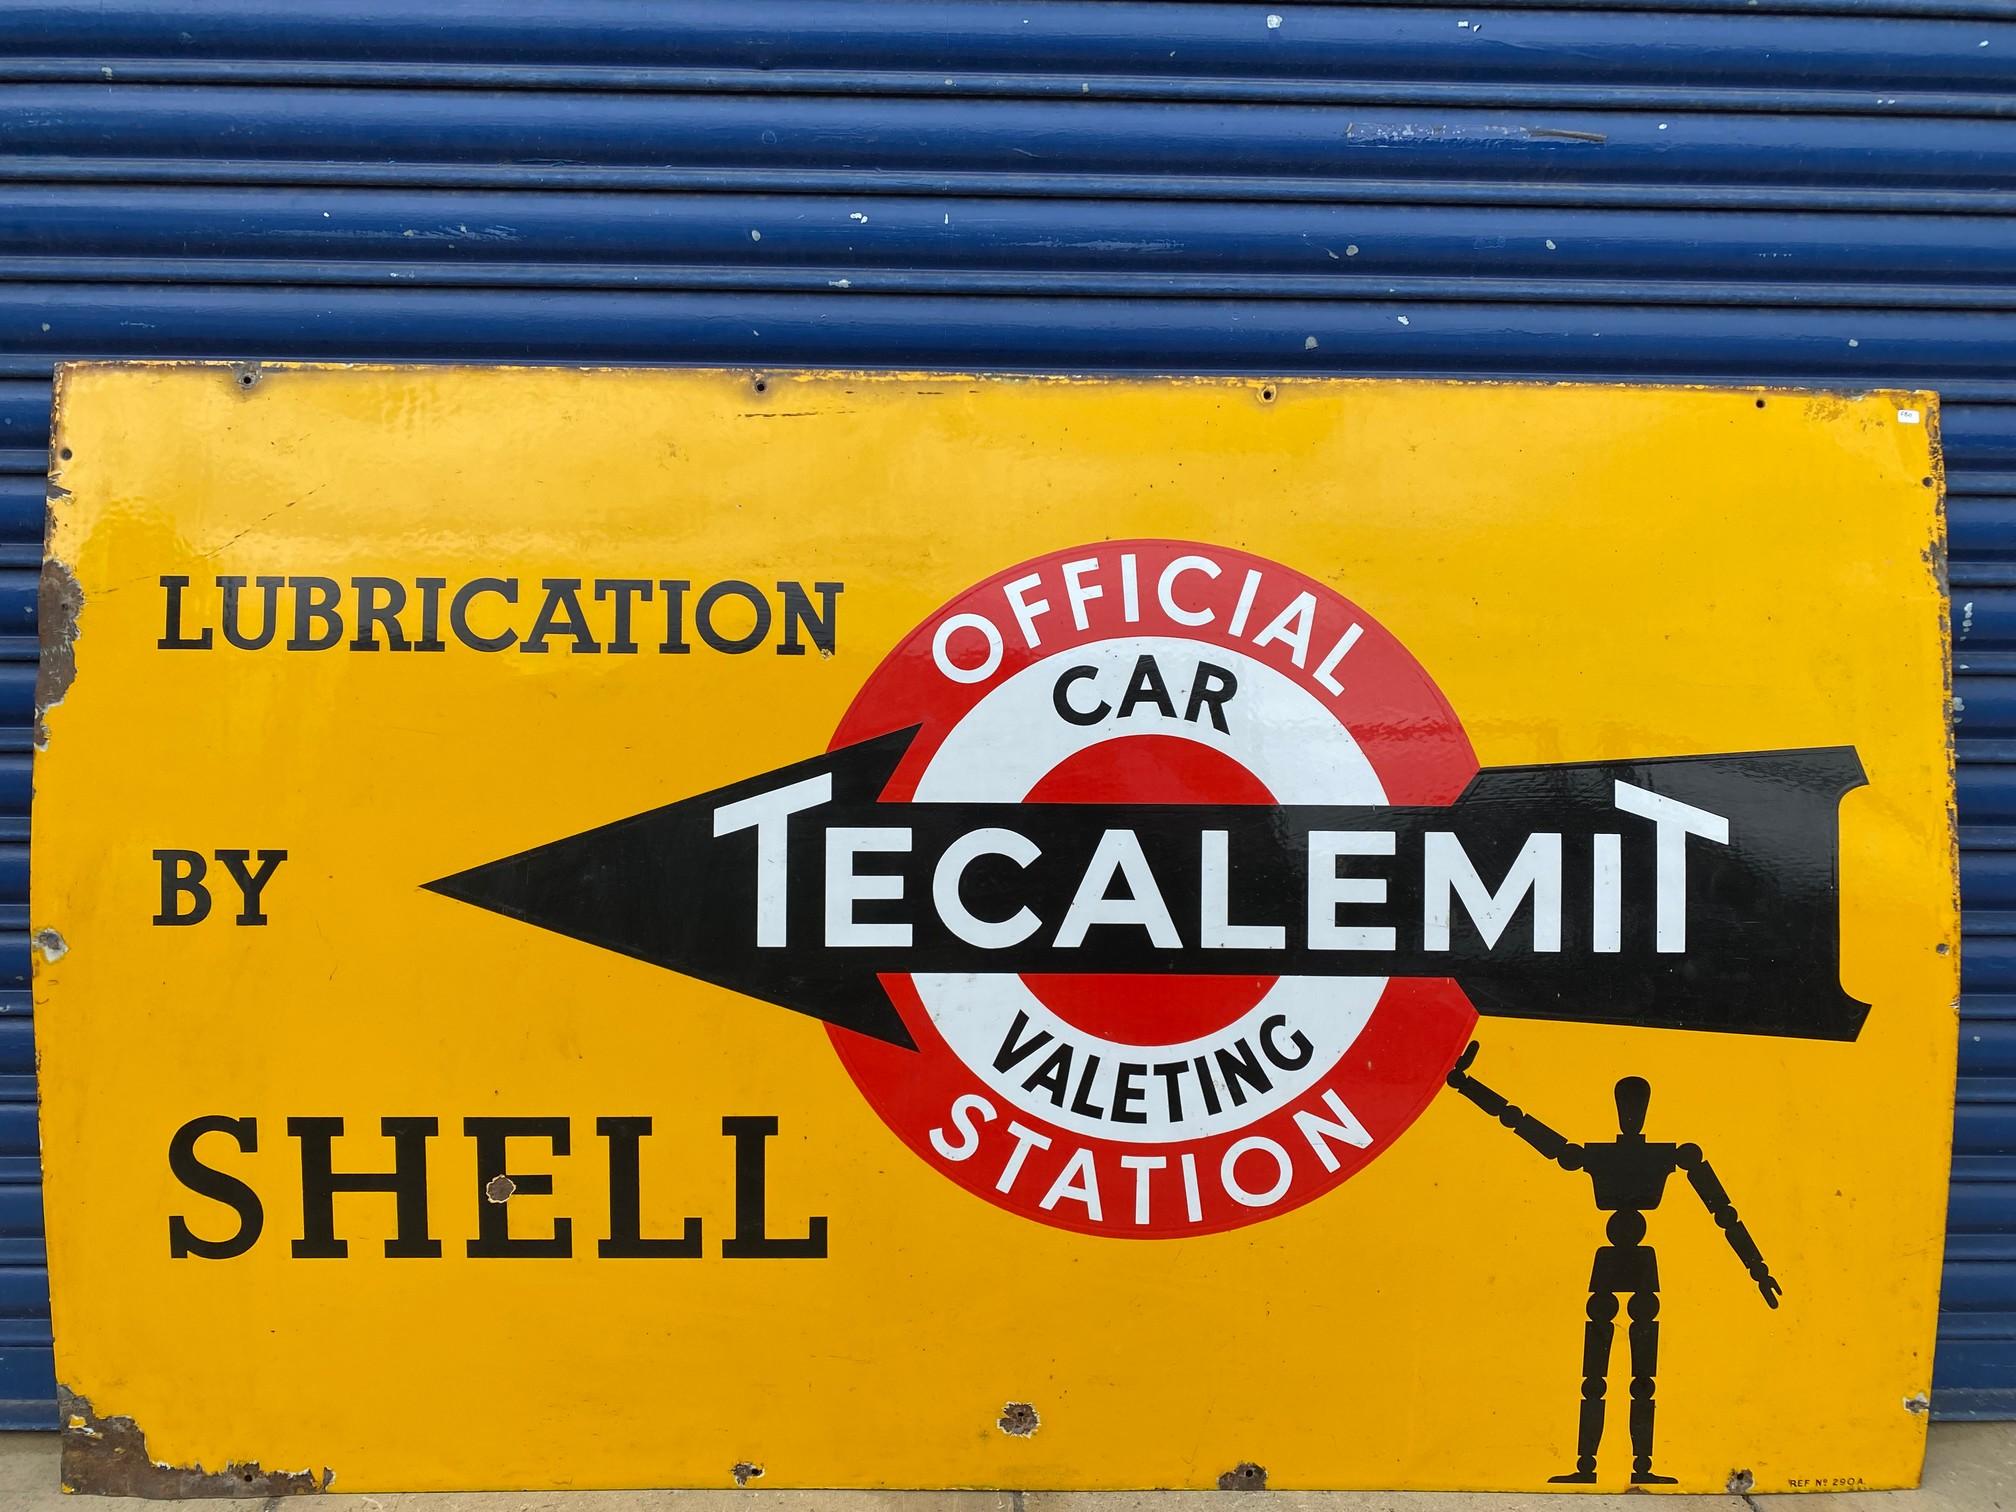 A rare Shell 'robert/stick man' Tecalemit Official Car Valeting Station rectangular enamel sign in